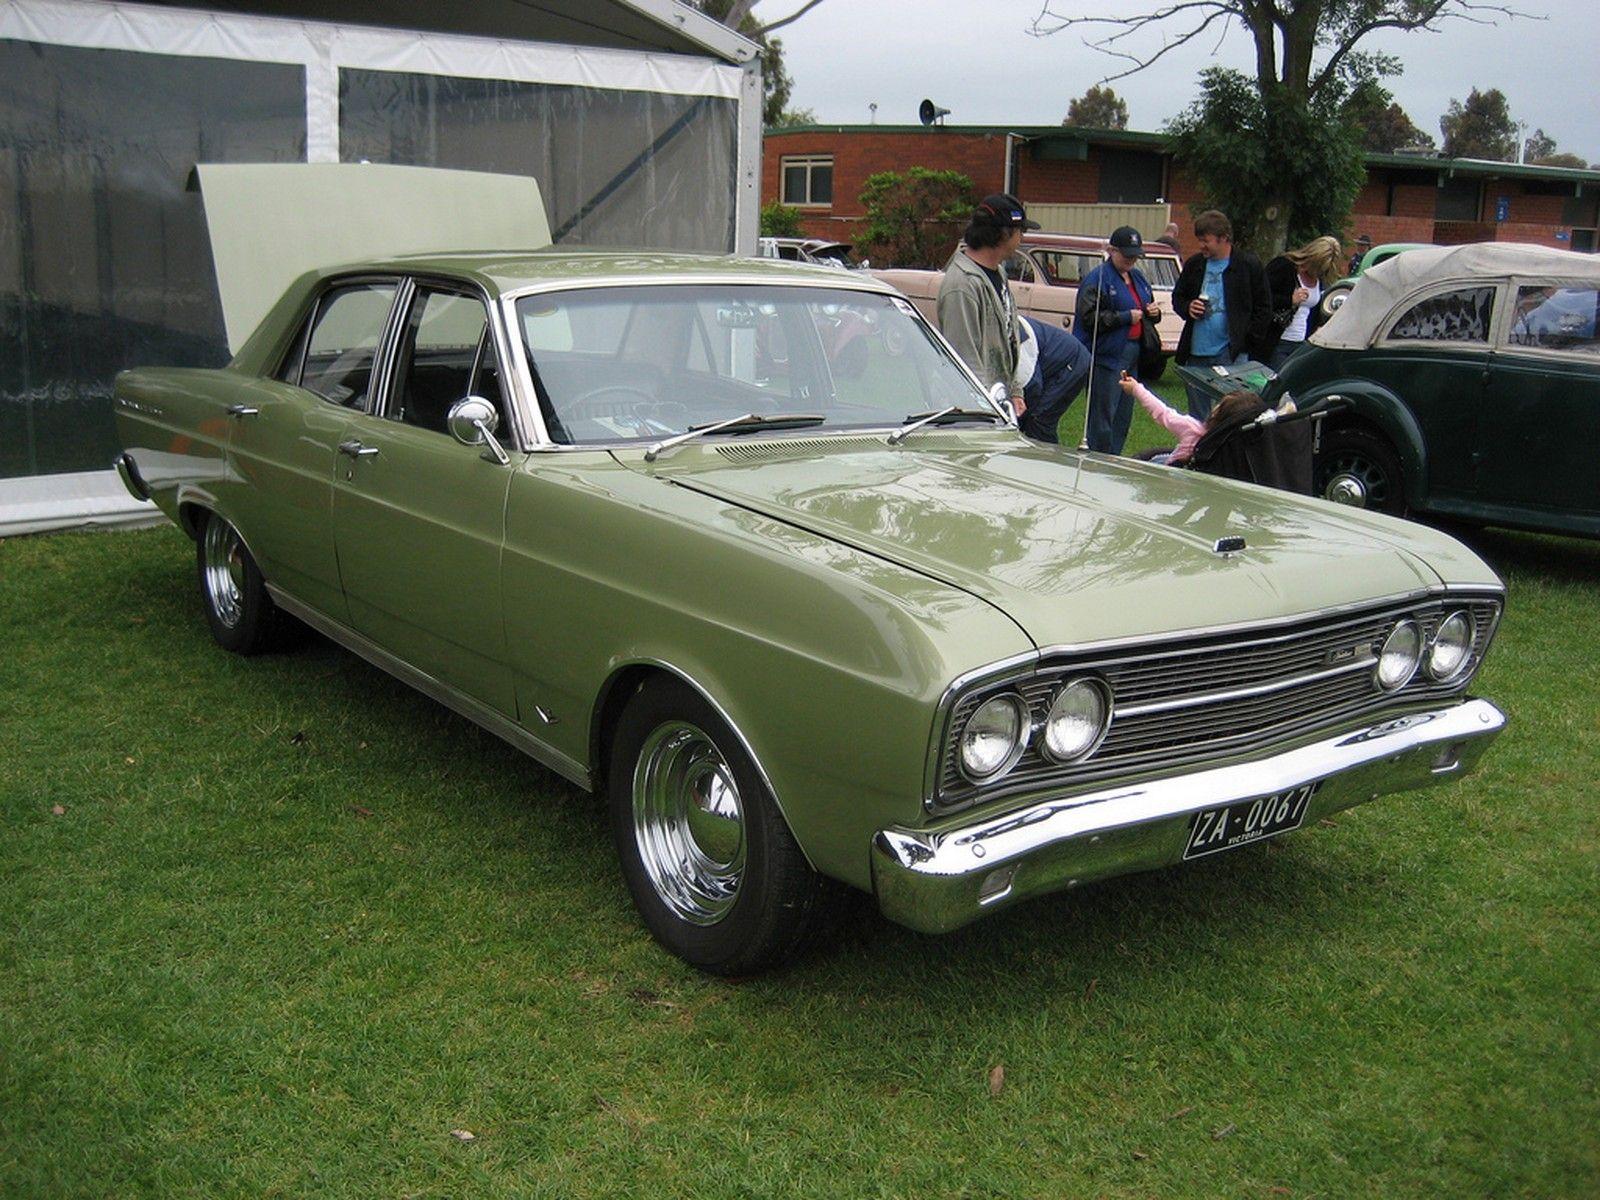 1967 - Ford ZA Fairlane 500   Ford Fairlane   Pinterest   Ford, Ford fairlane and Cars